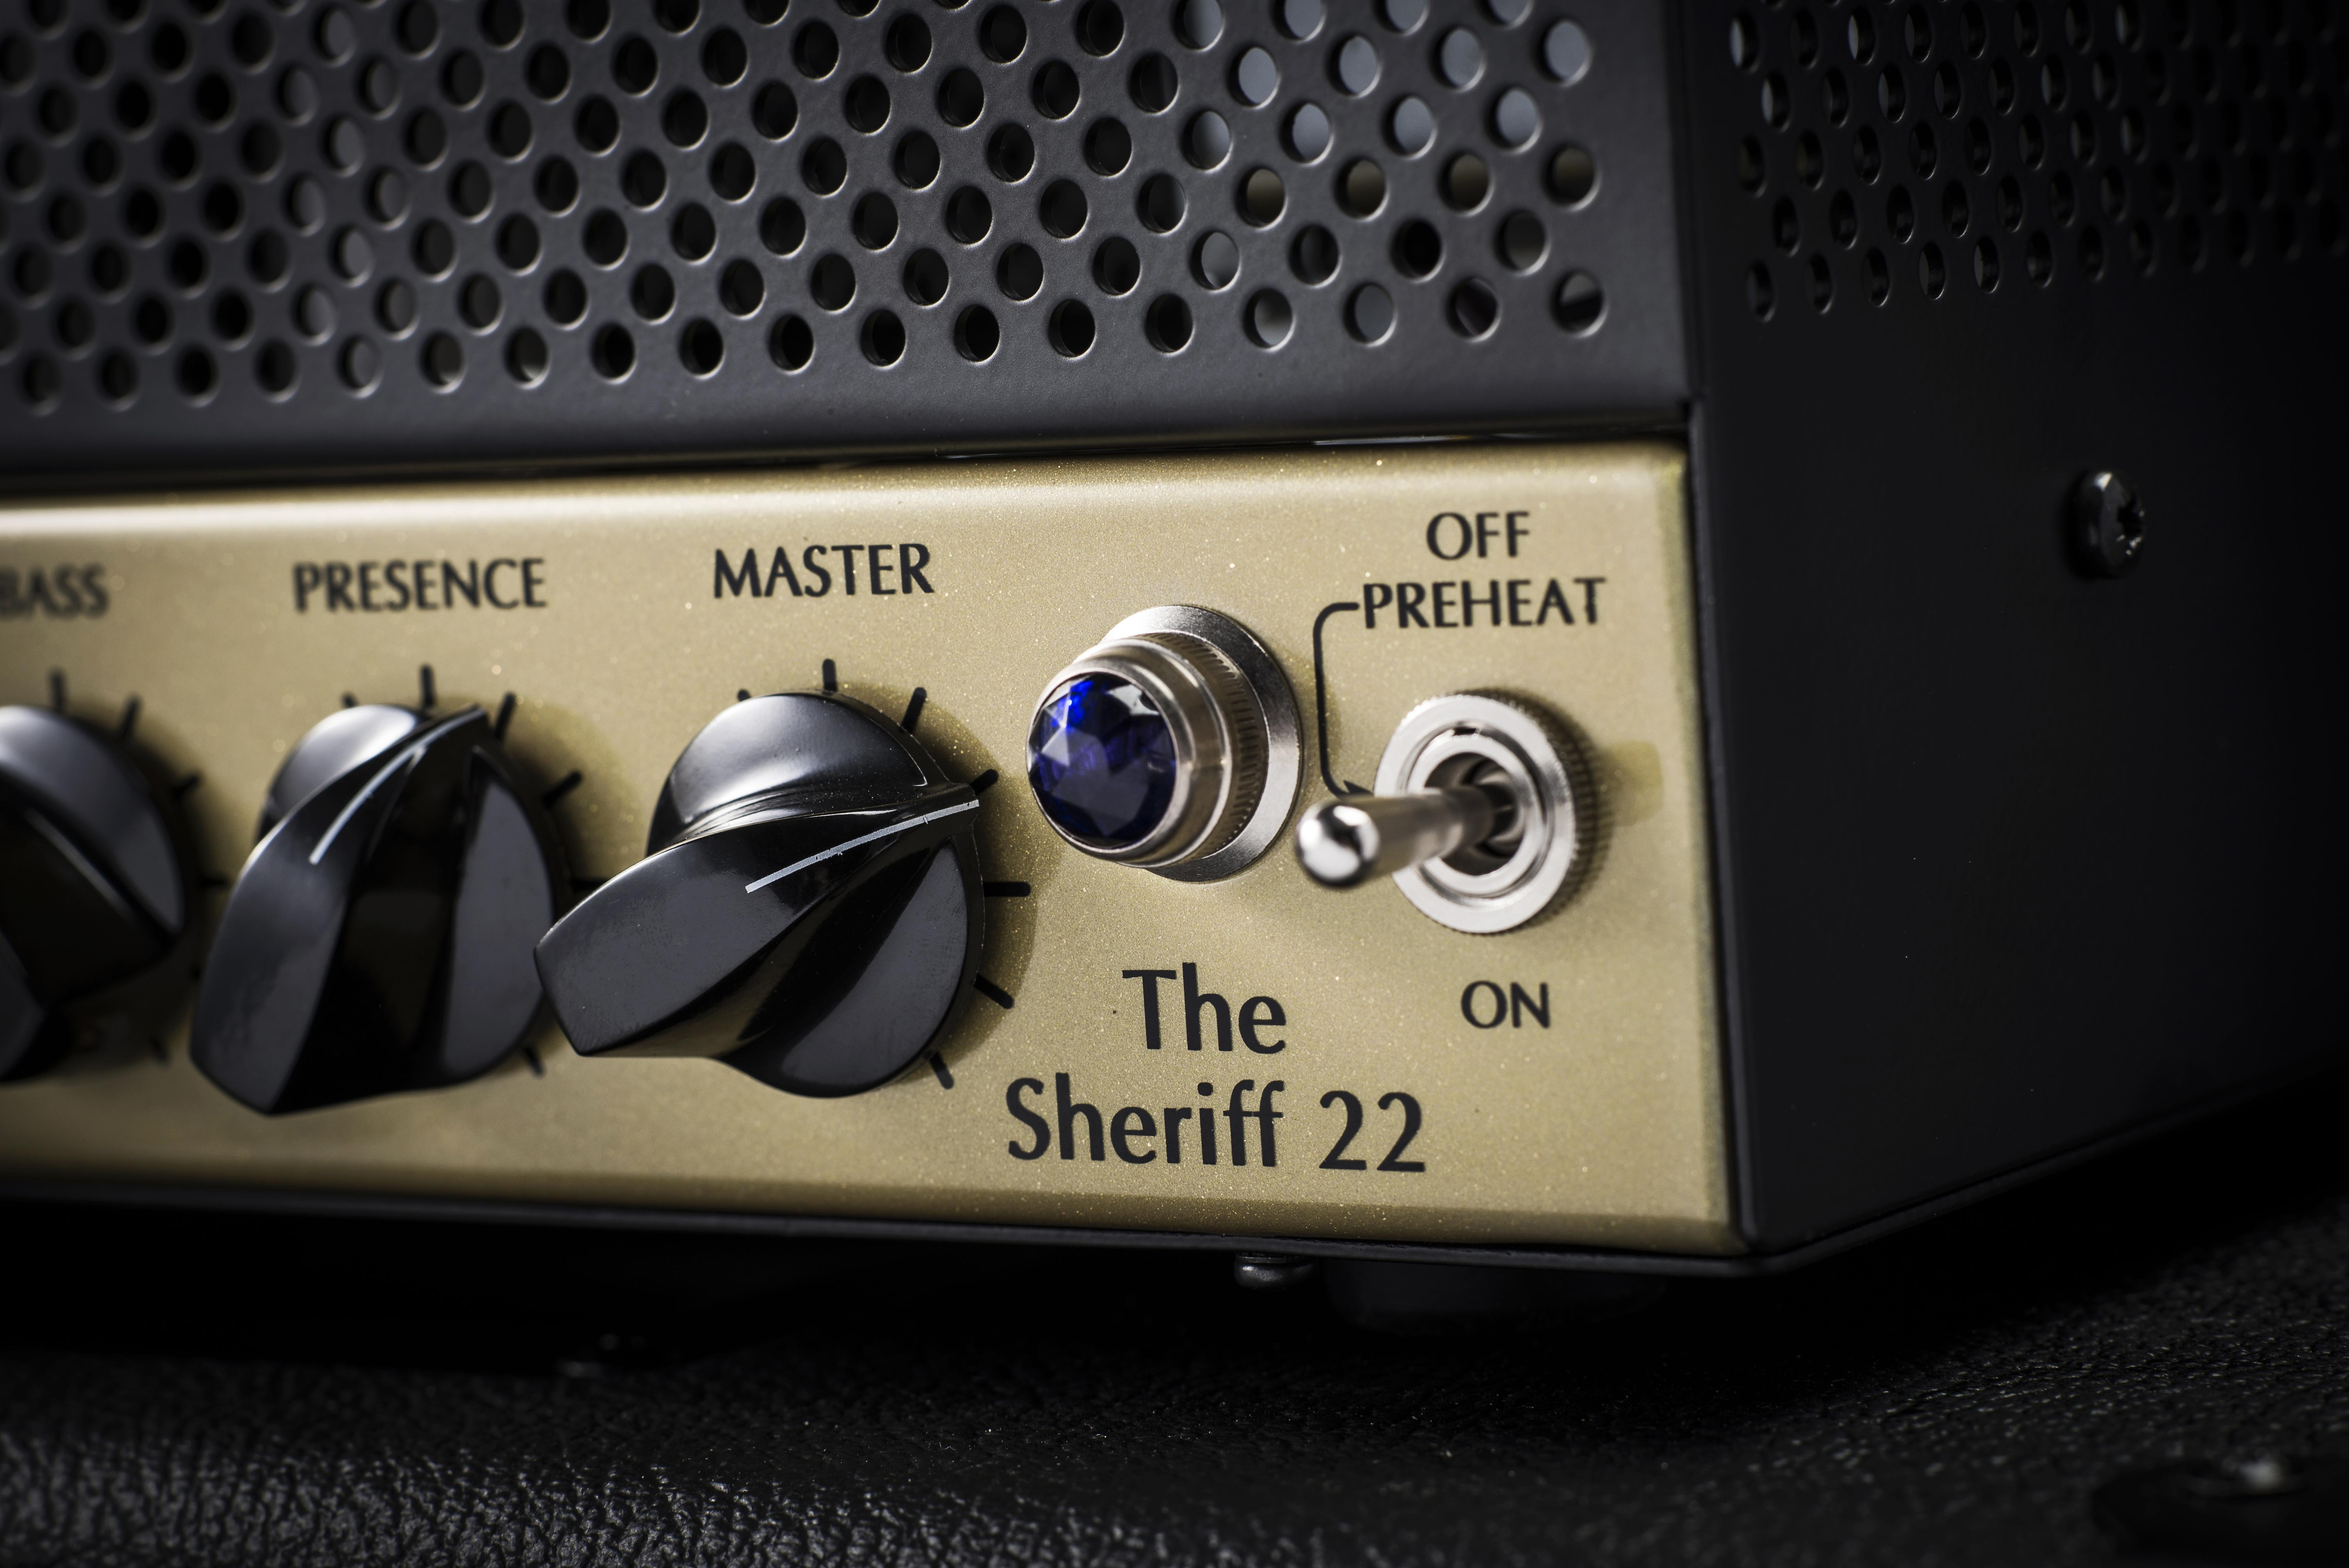 Sheriff 22